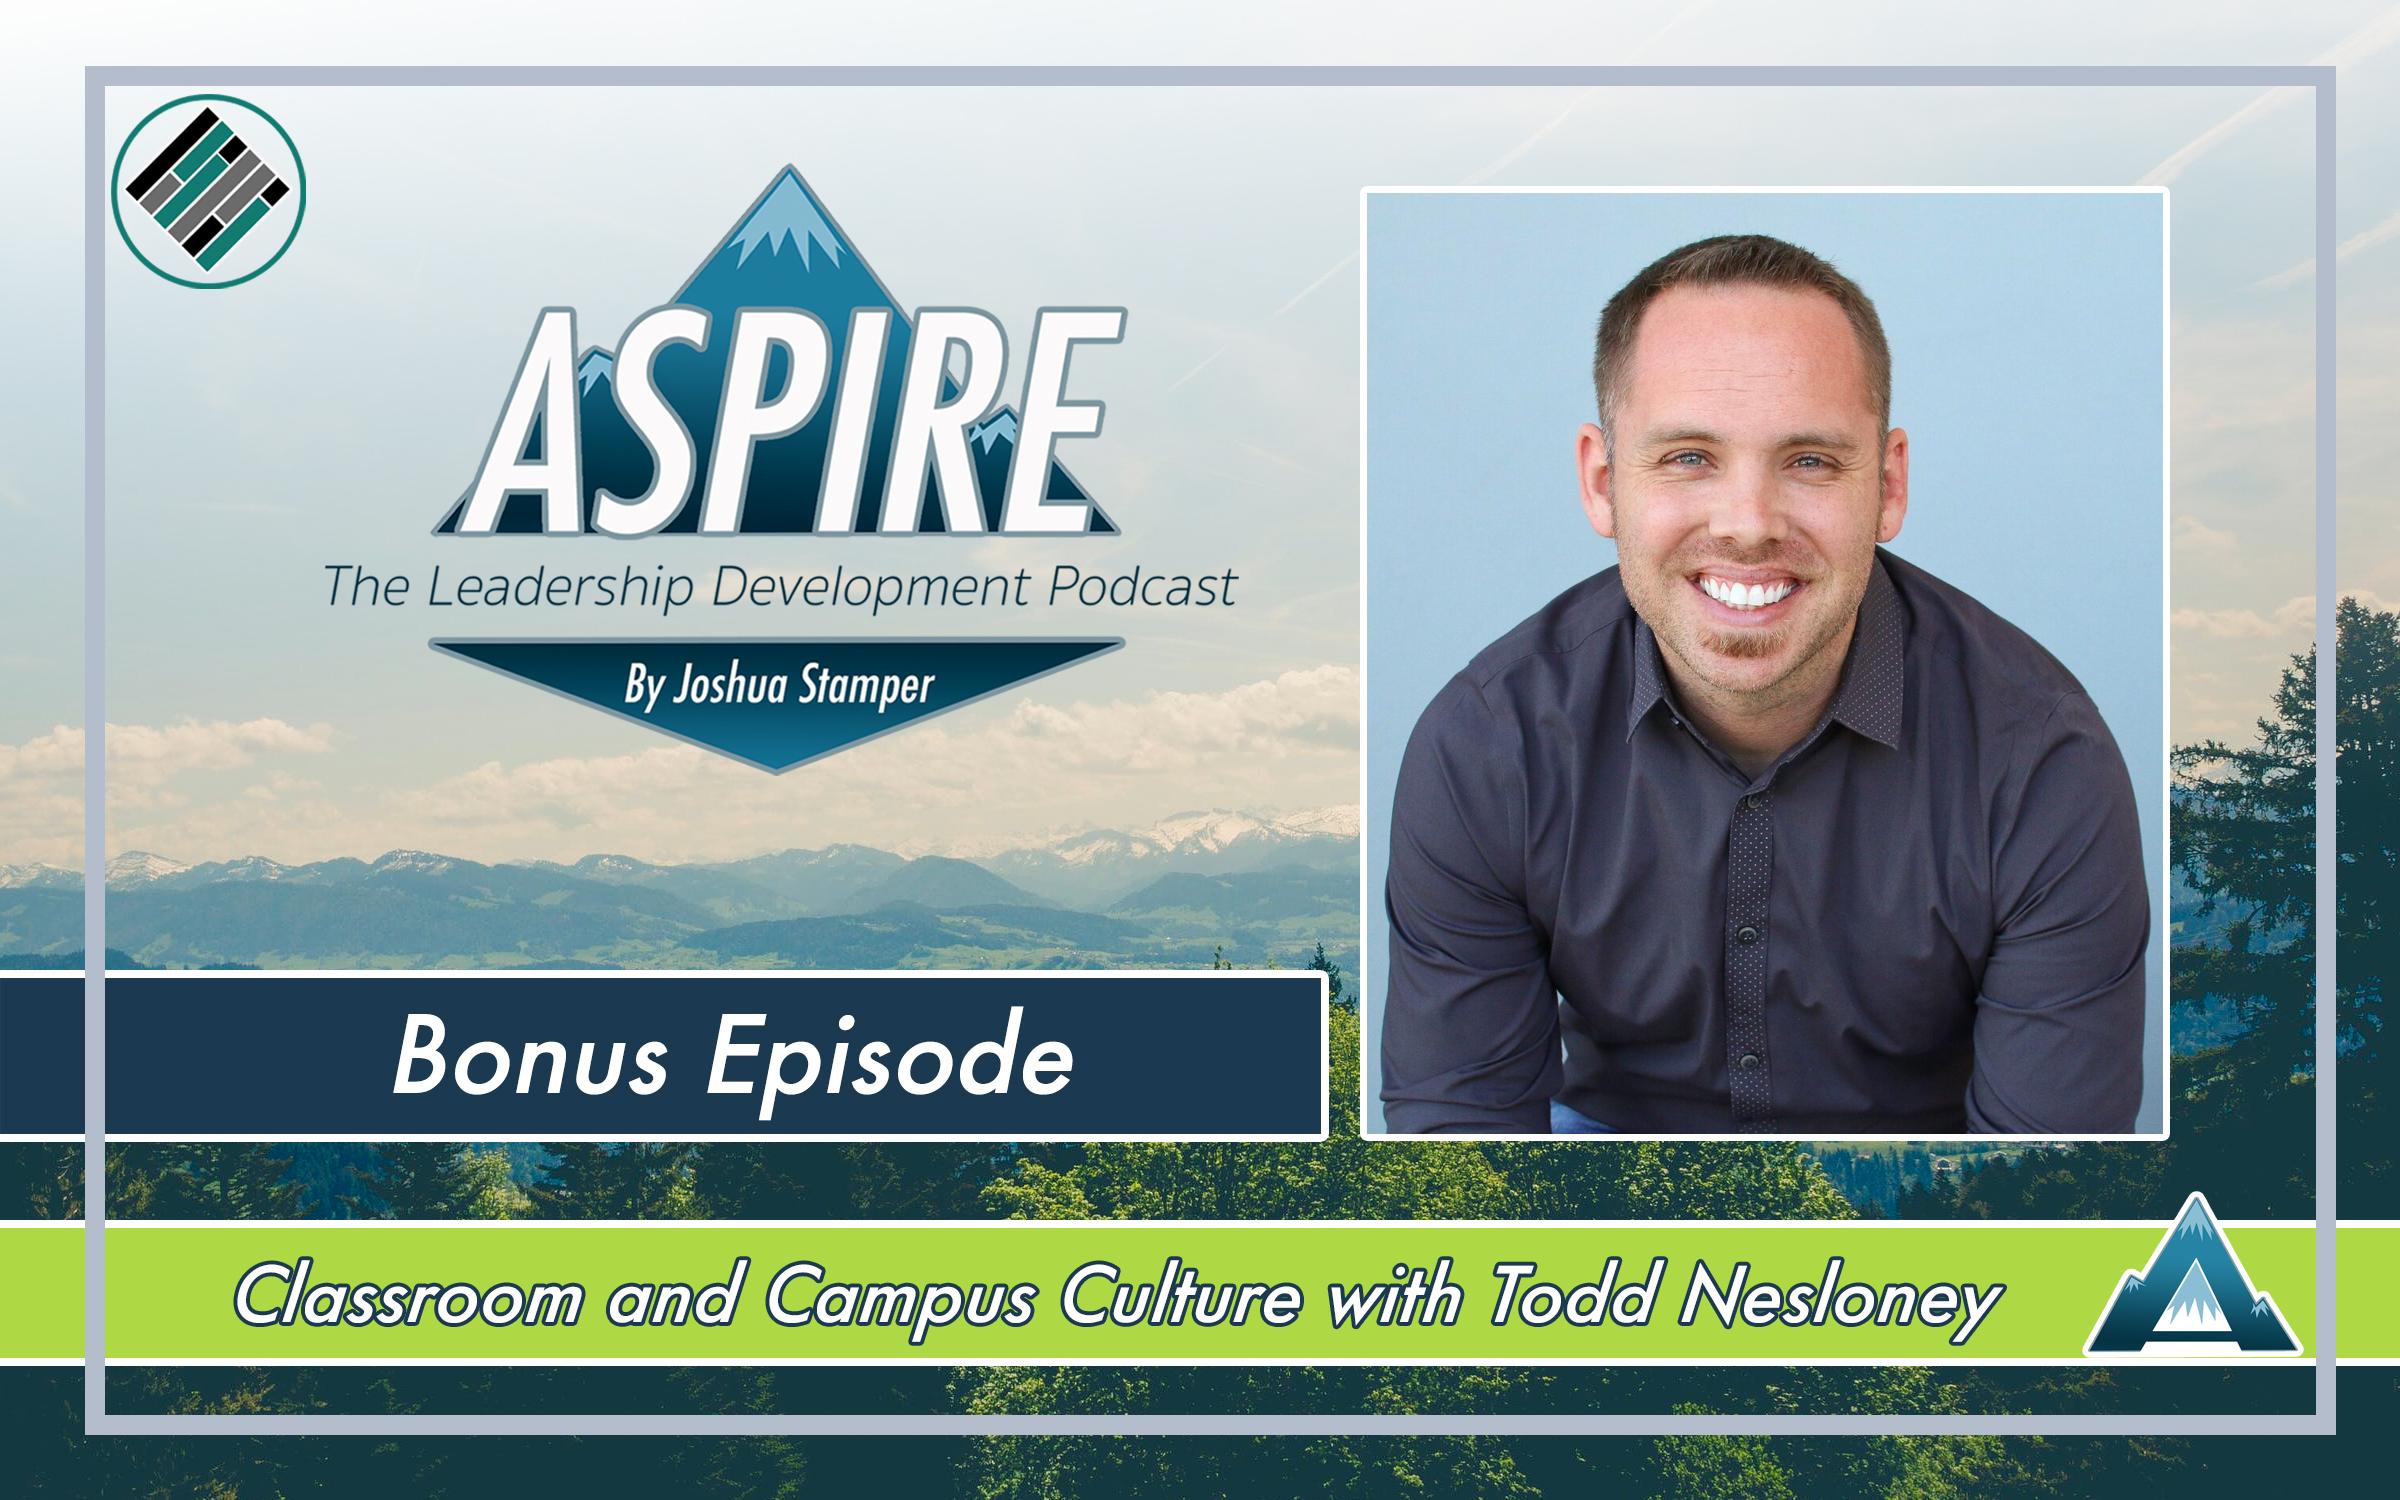 Joshua Stamper, Todd Nesloney, Aspire: The Leadership Development Podcast, #AspireLead, Campus Culture